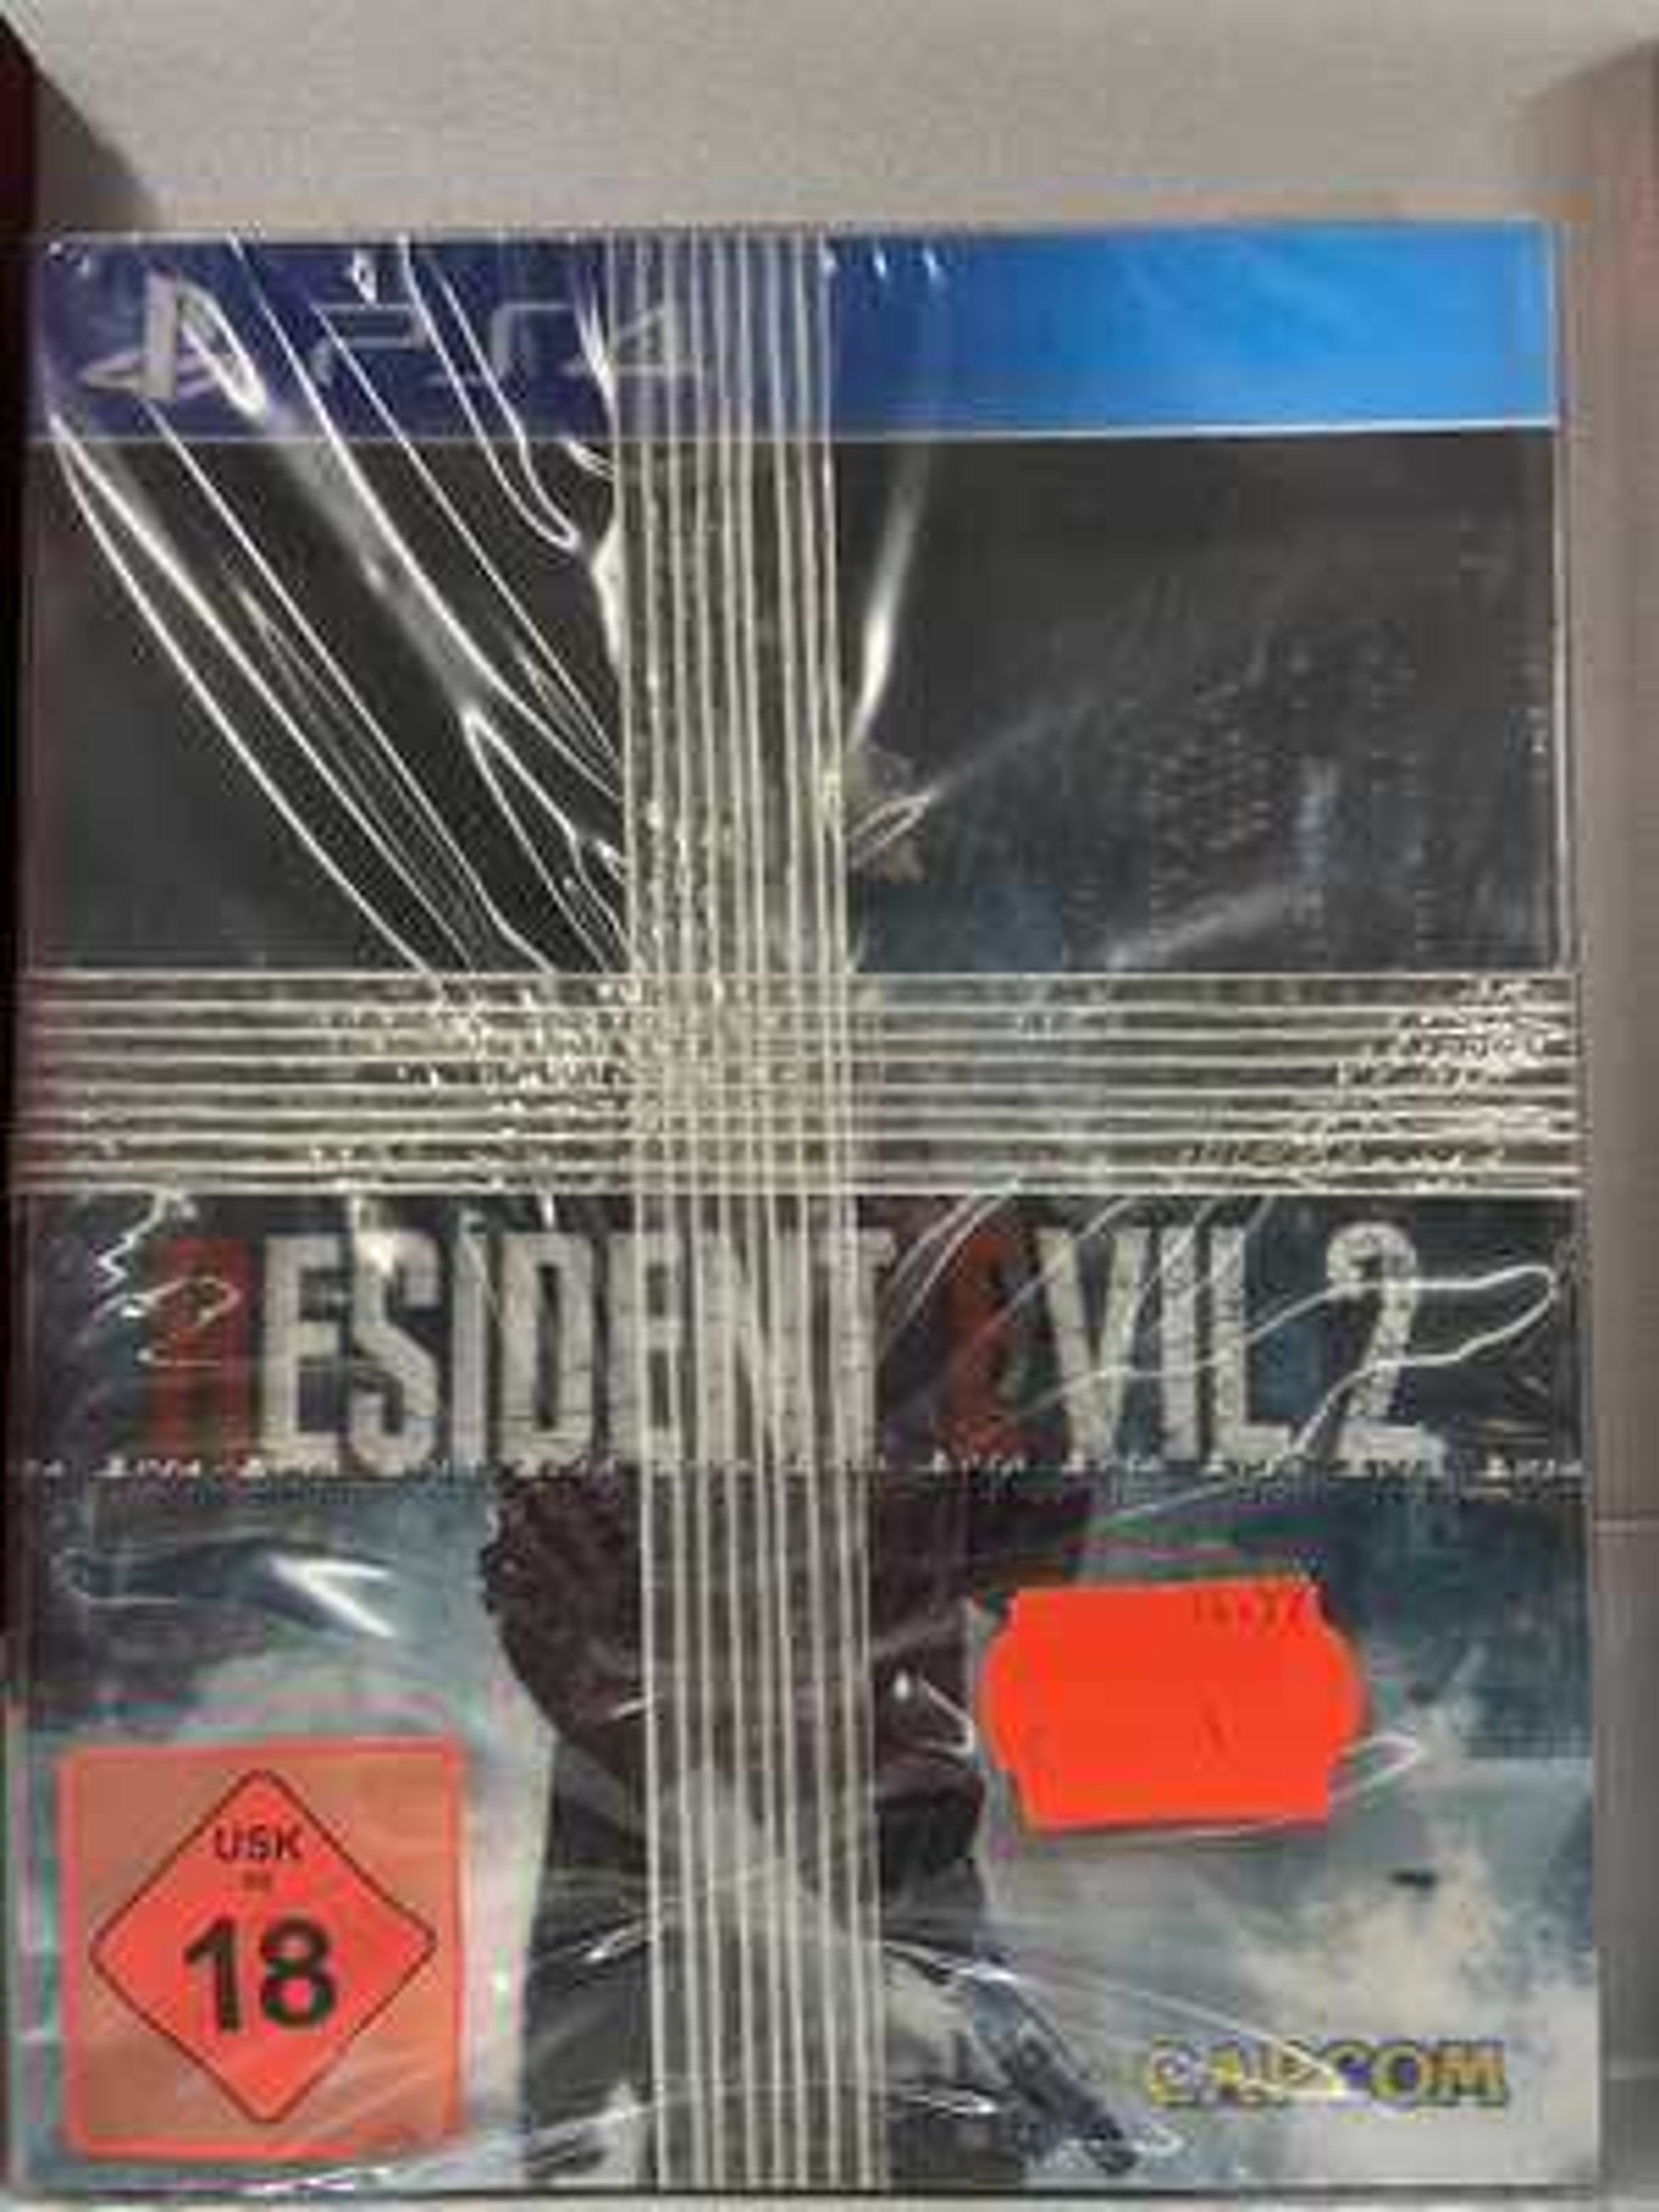 Lokal - Saturn Siegburg - Resident Evil 2 Limited Lenticular Edition PS4